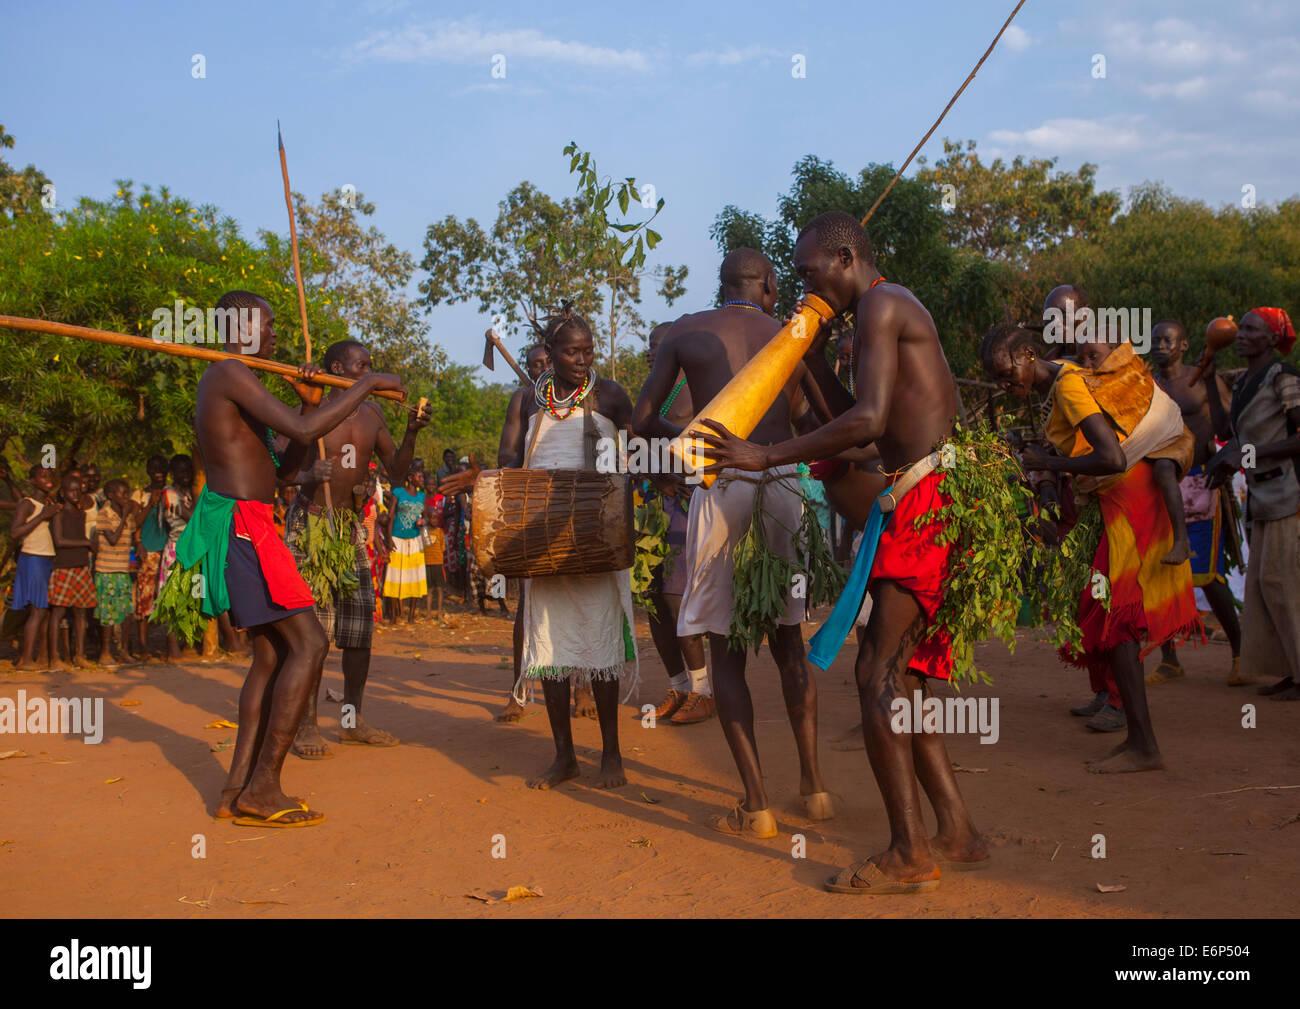 Majang Tribe Dancing For A Celebration, Kobown, Ethiopia - Stock Image